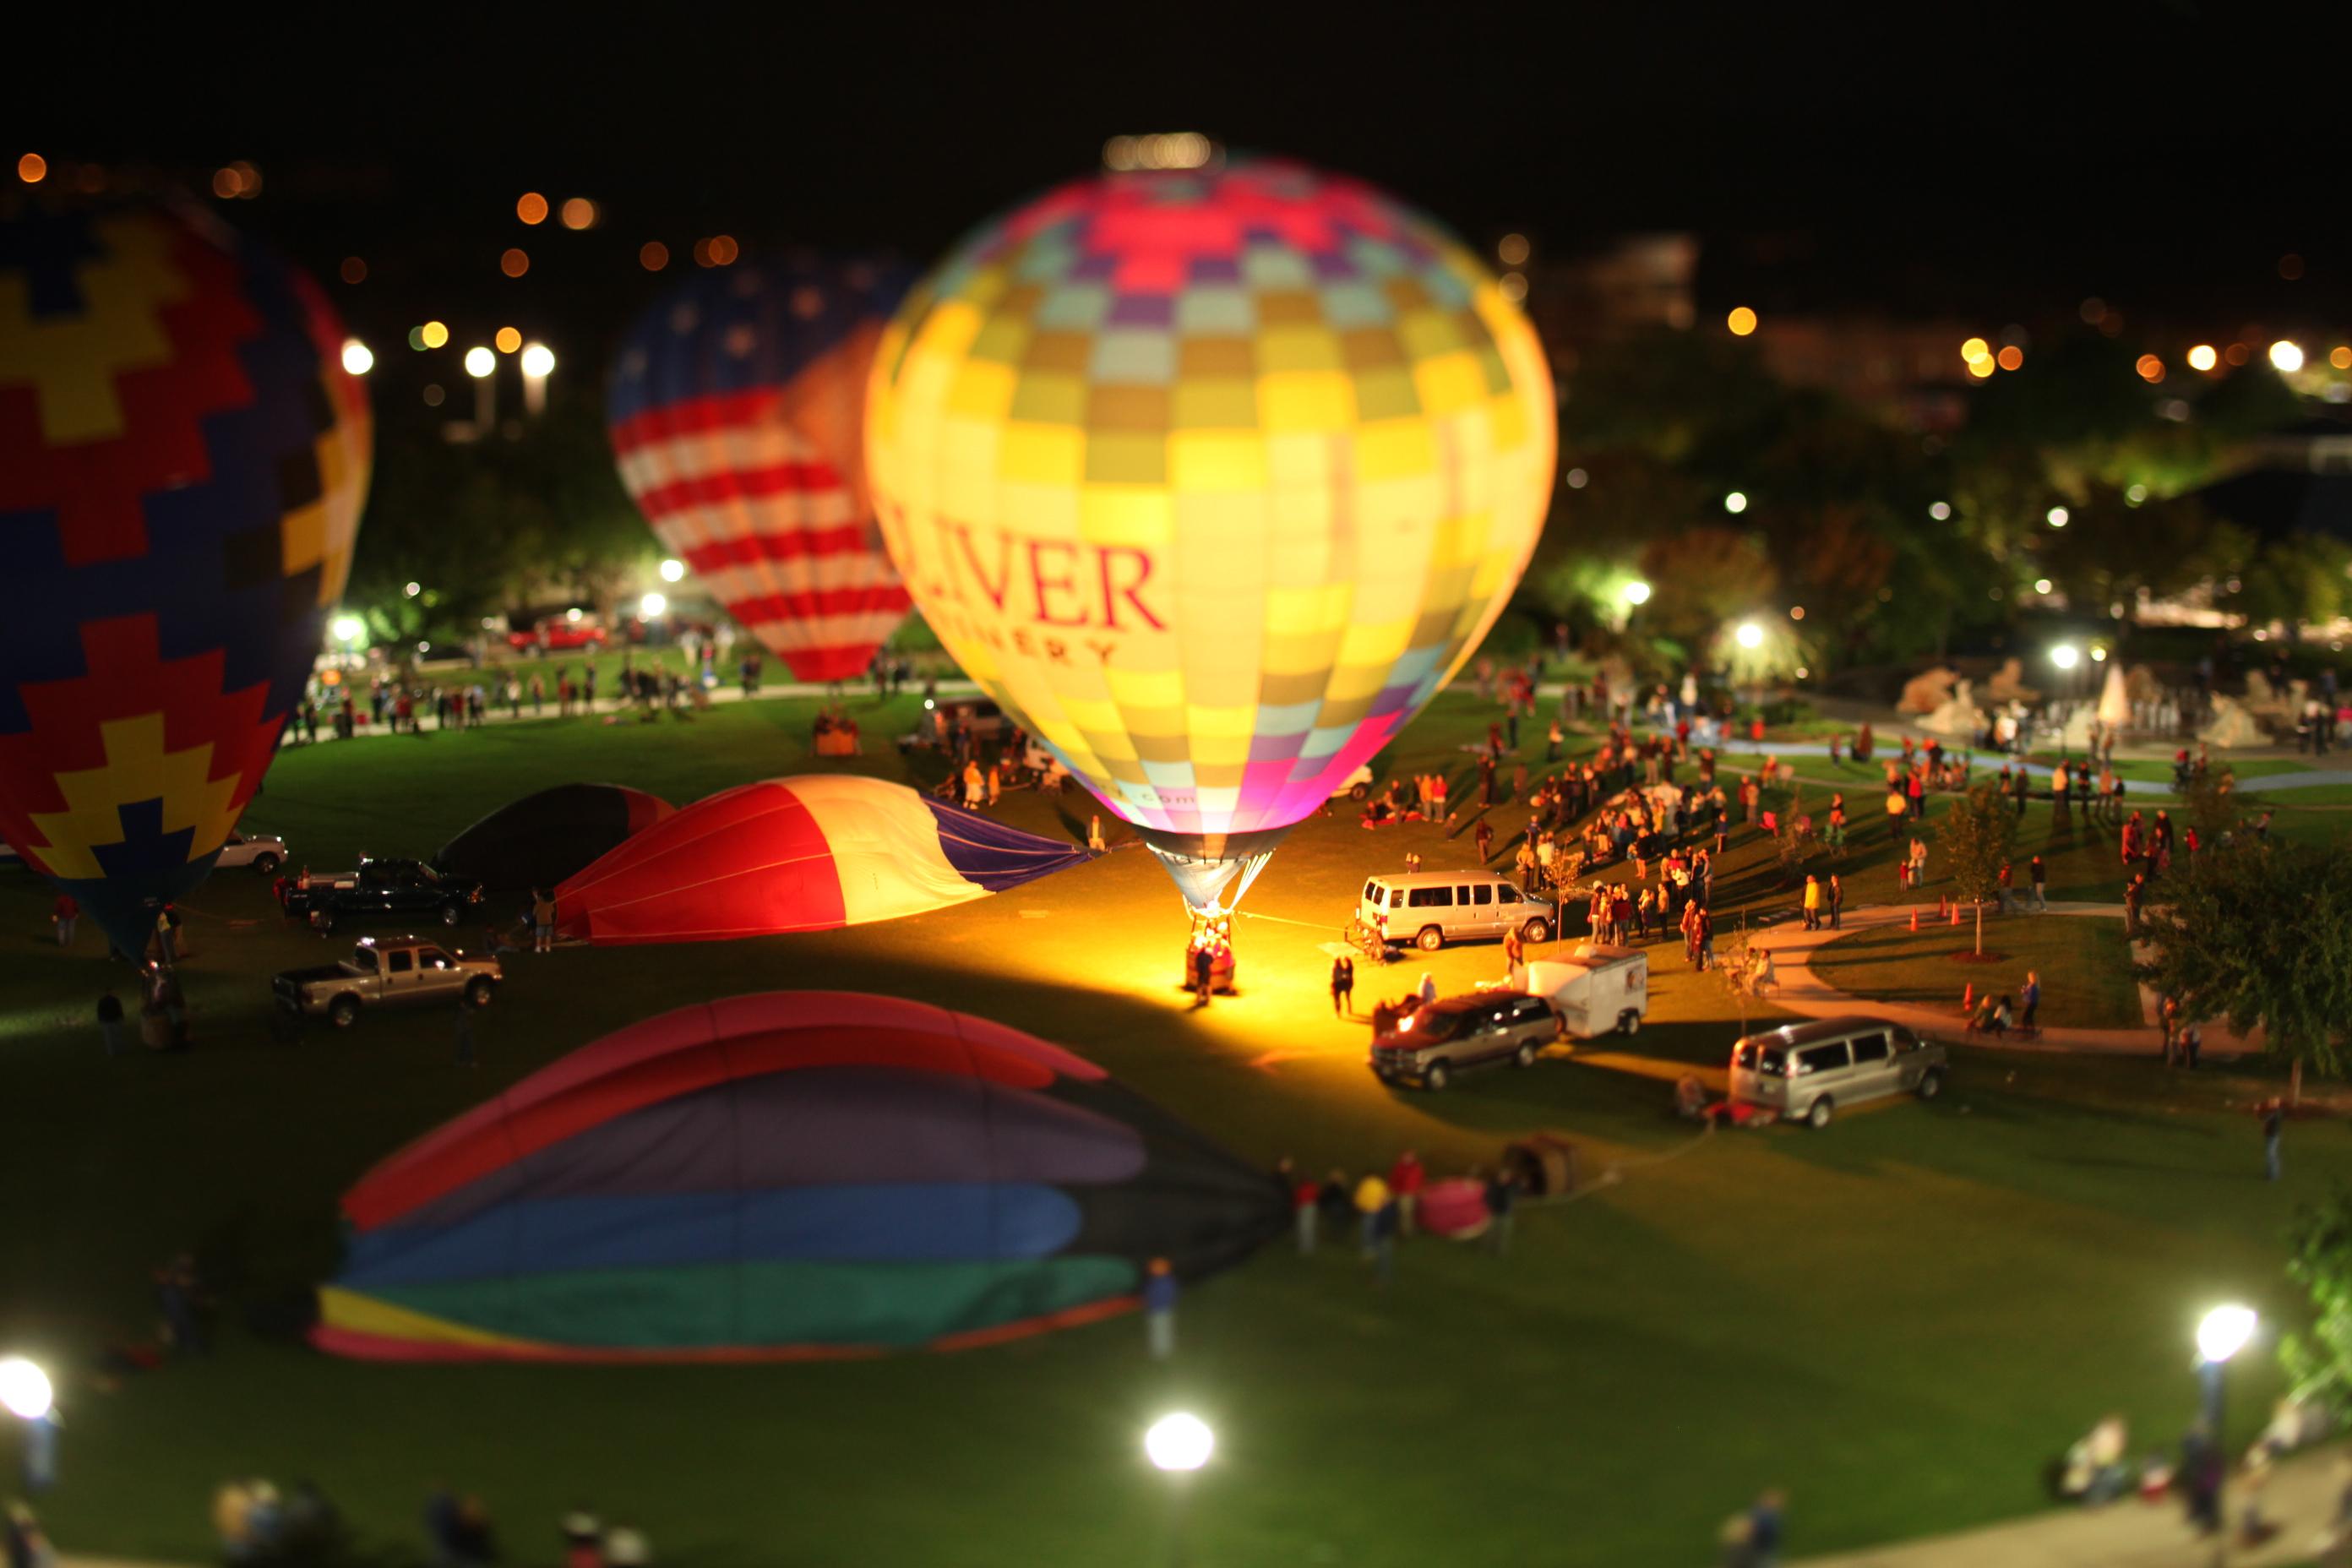 fall in chattanooga tn balloon glow festivals brilliant colors